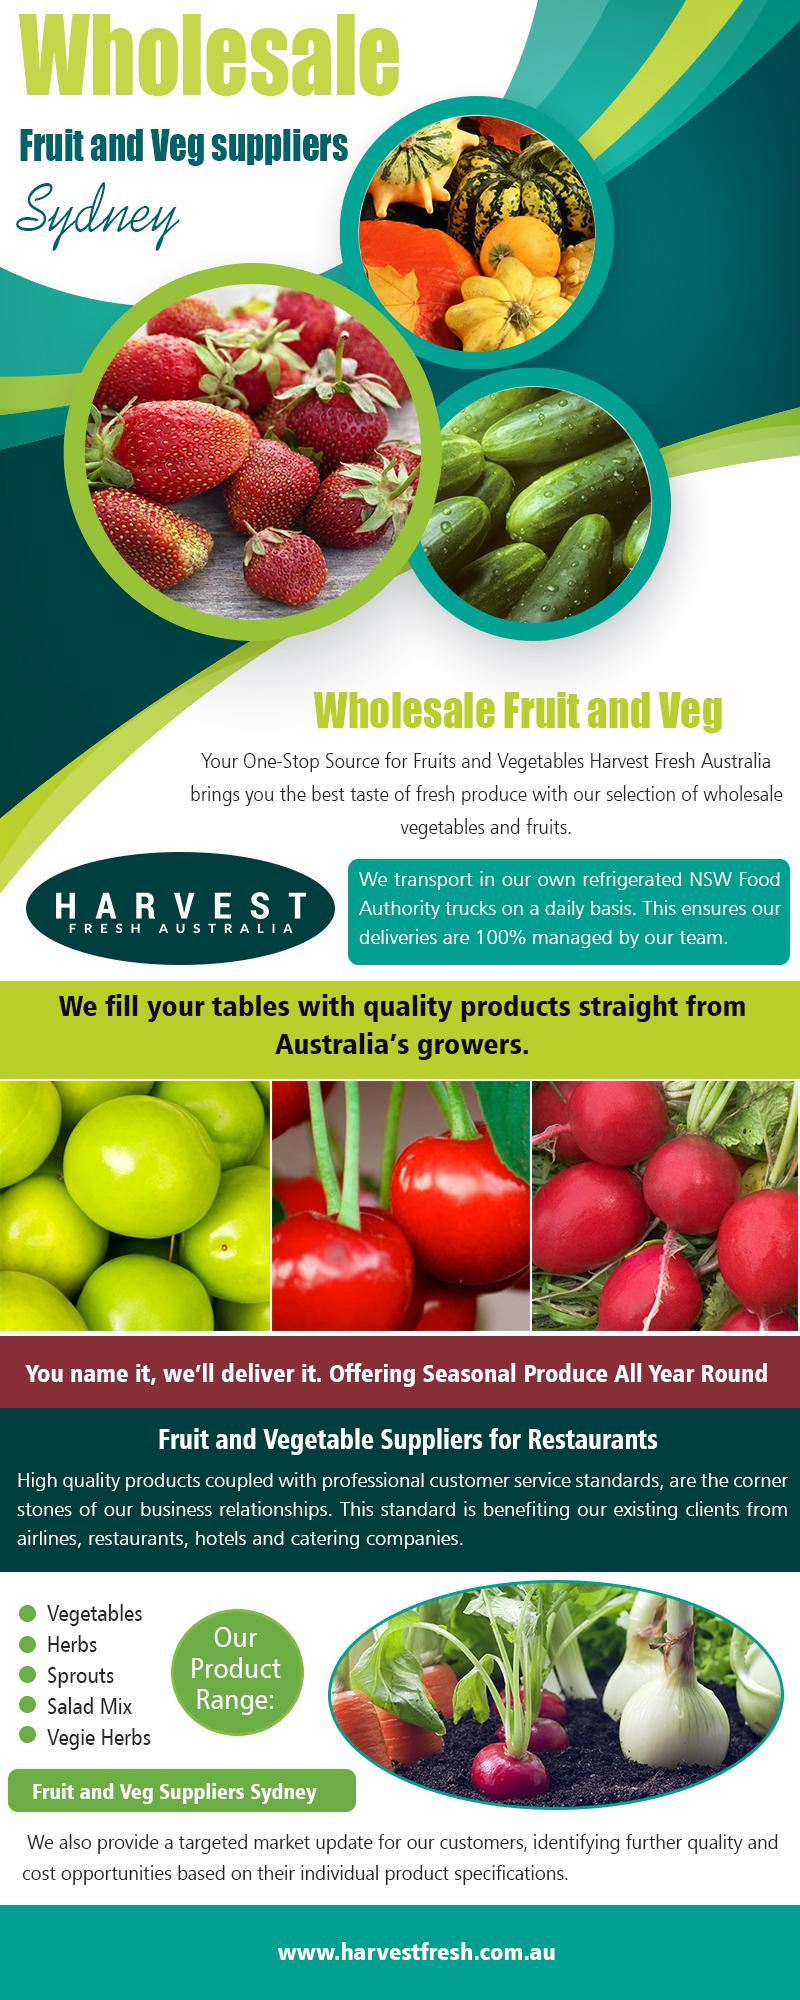 Wholesale Fruit and Veg Suppliers Sydney